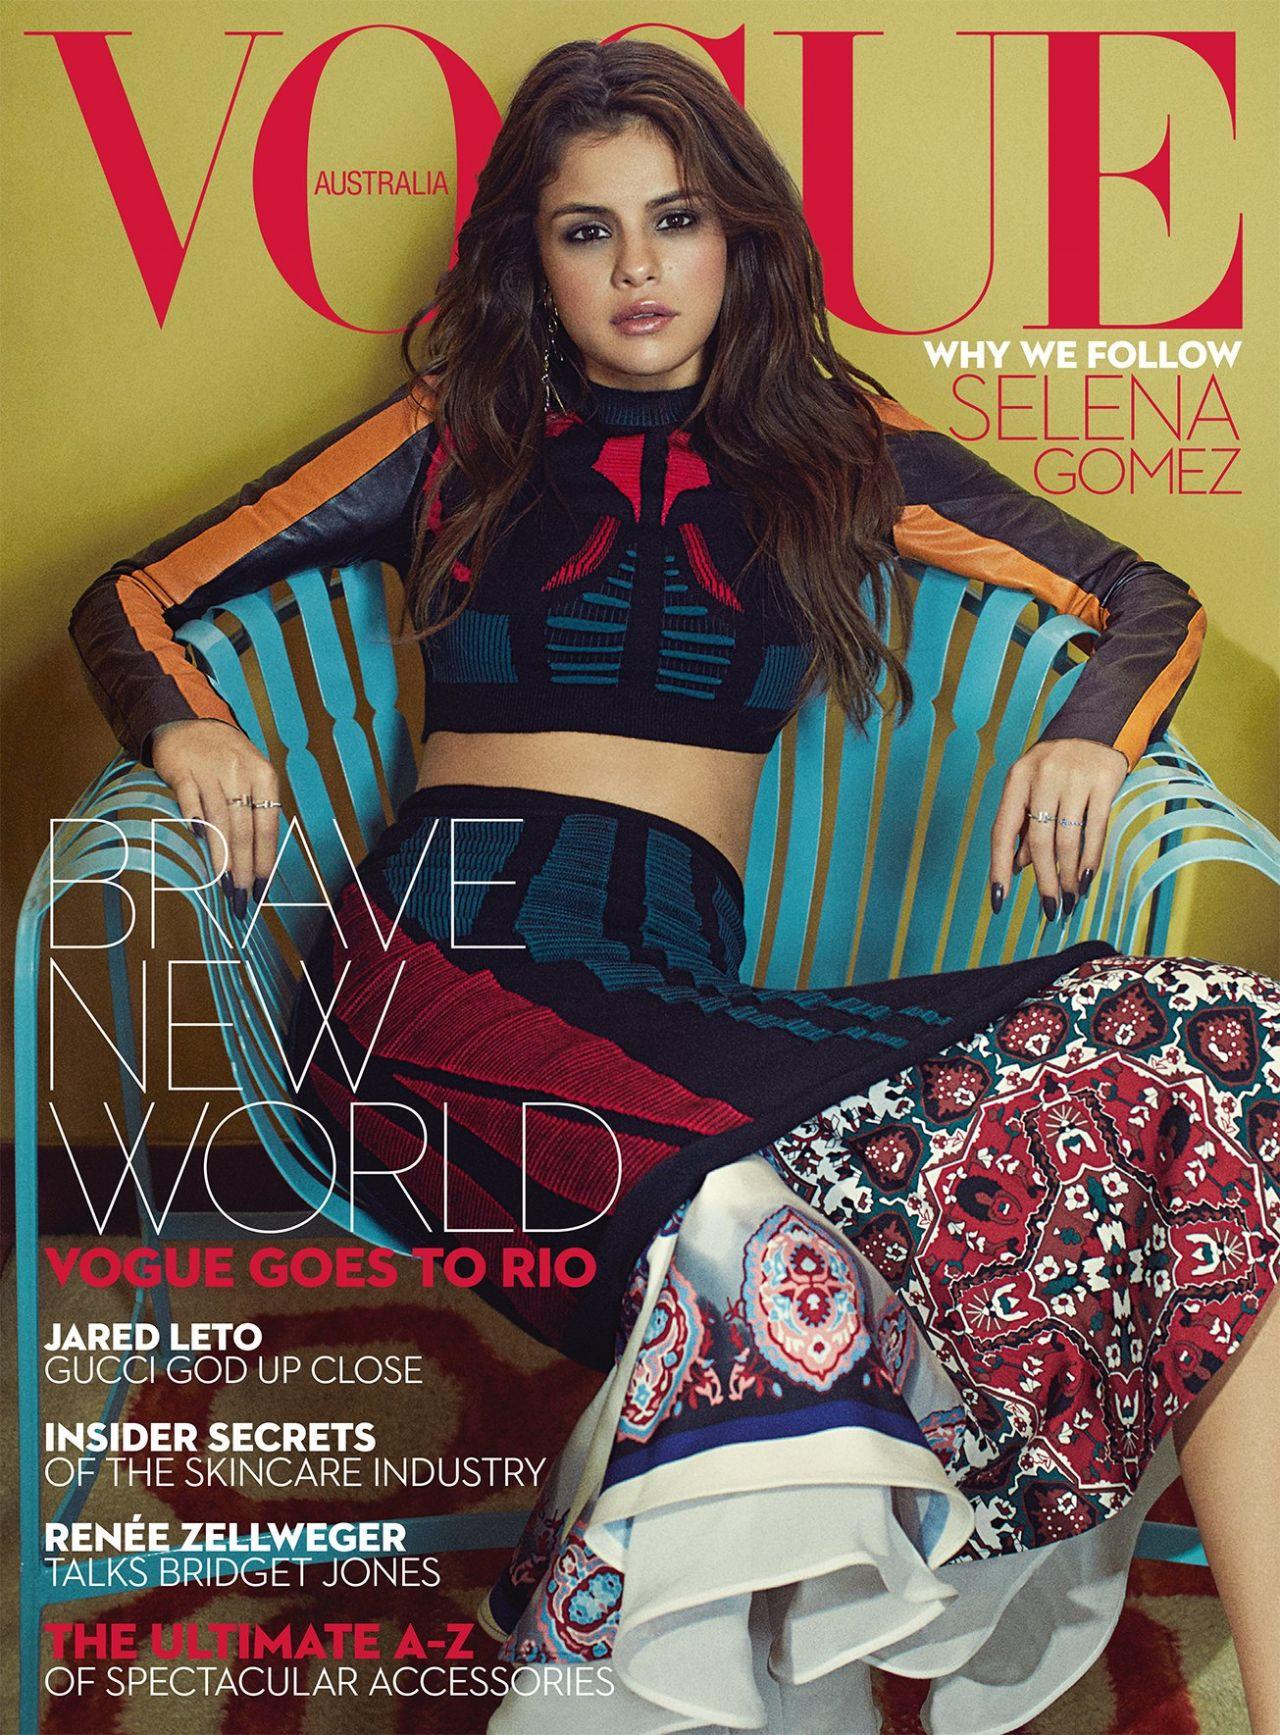 September 2016 Popsugar Must Have Box Review: Vogue Magazine Australia September 2016